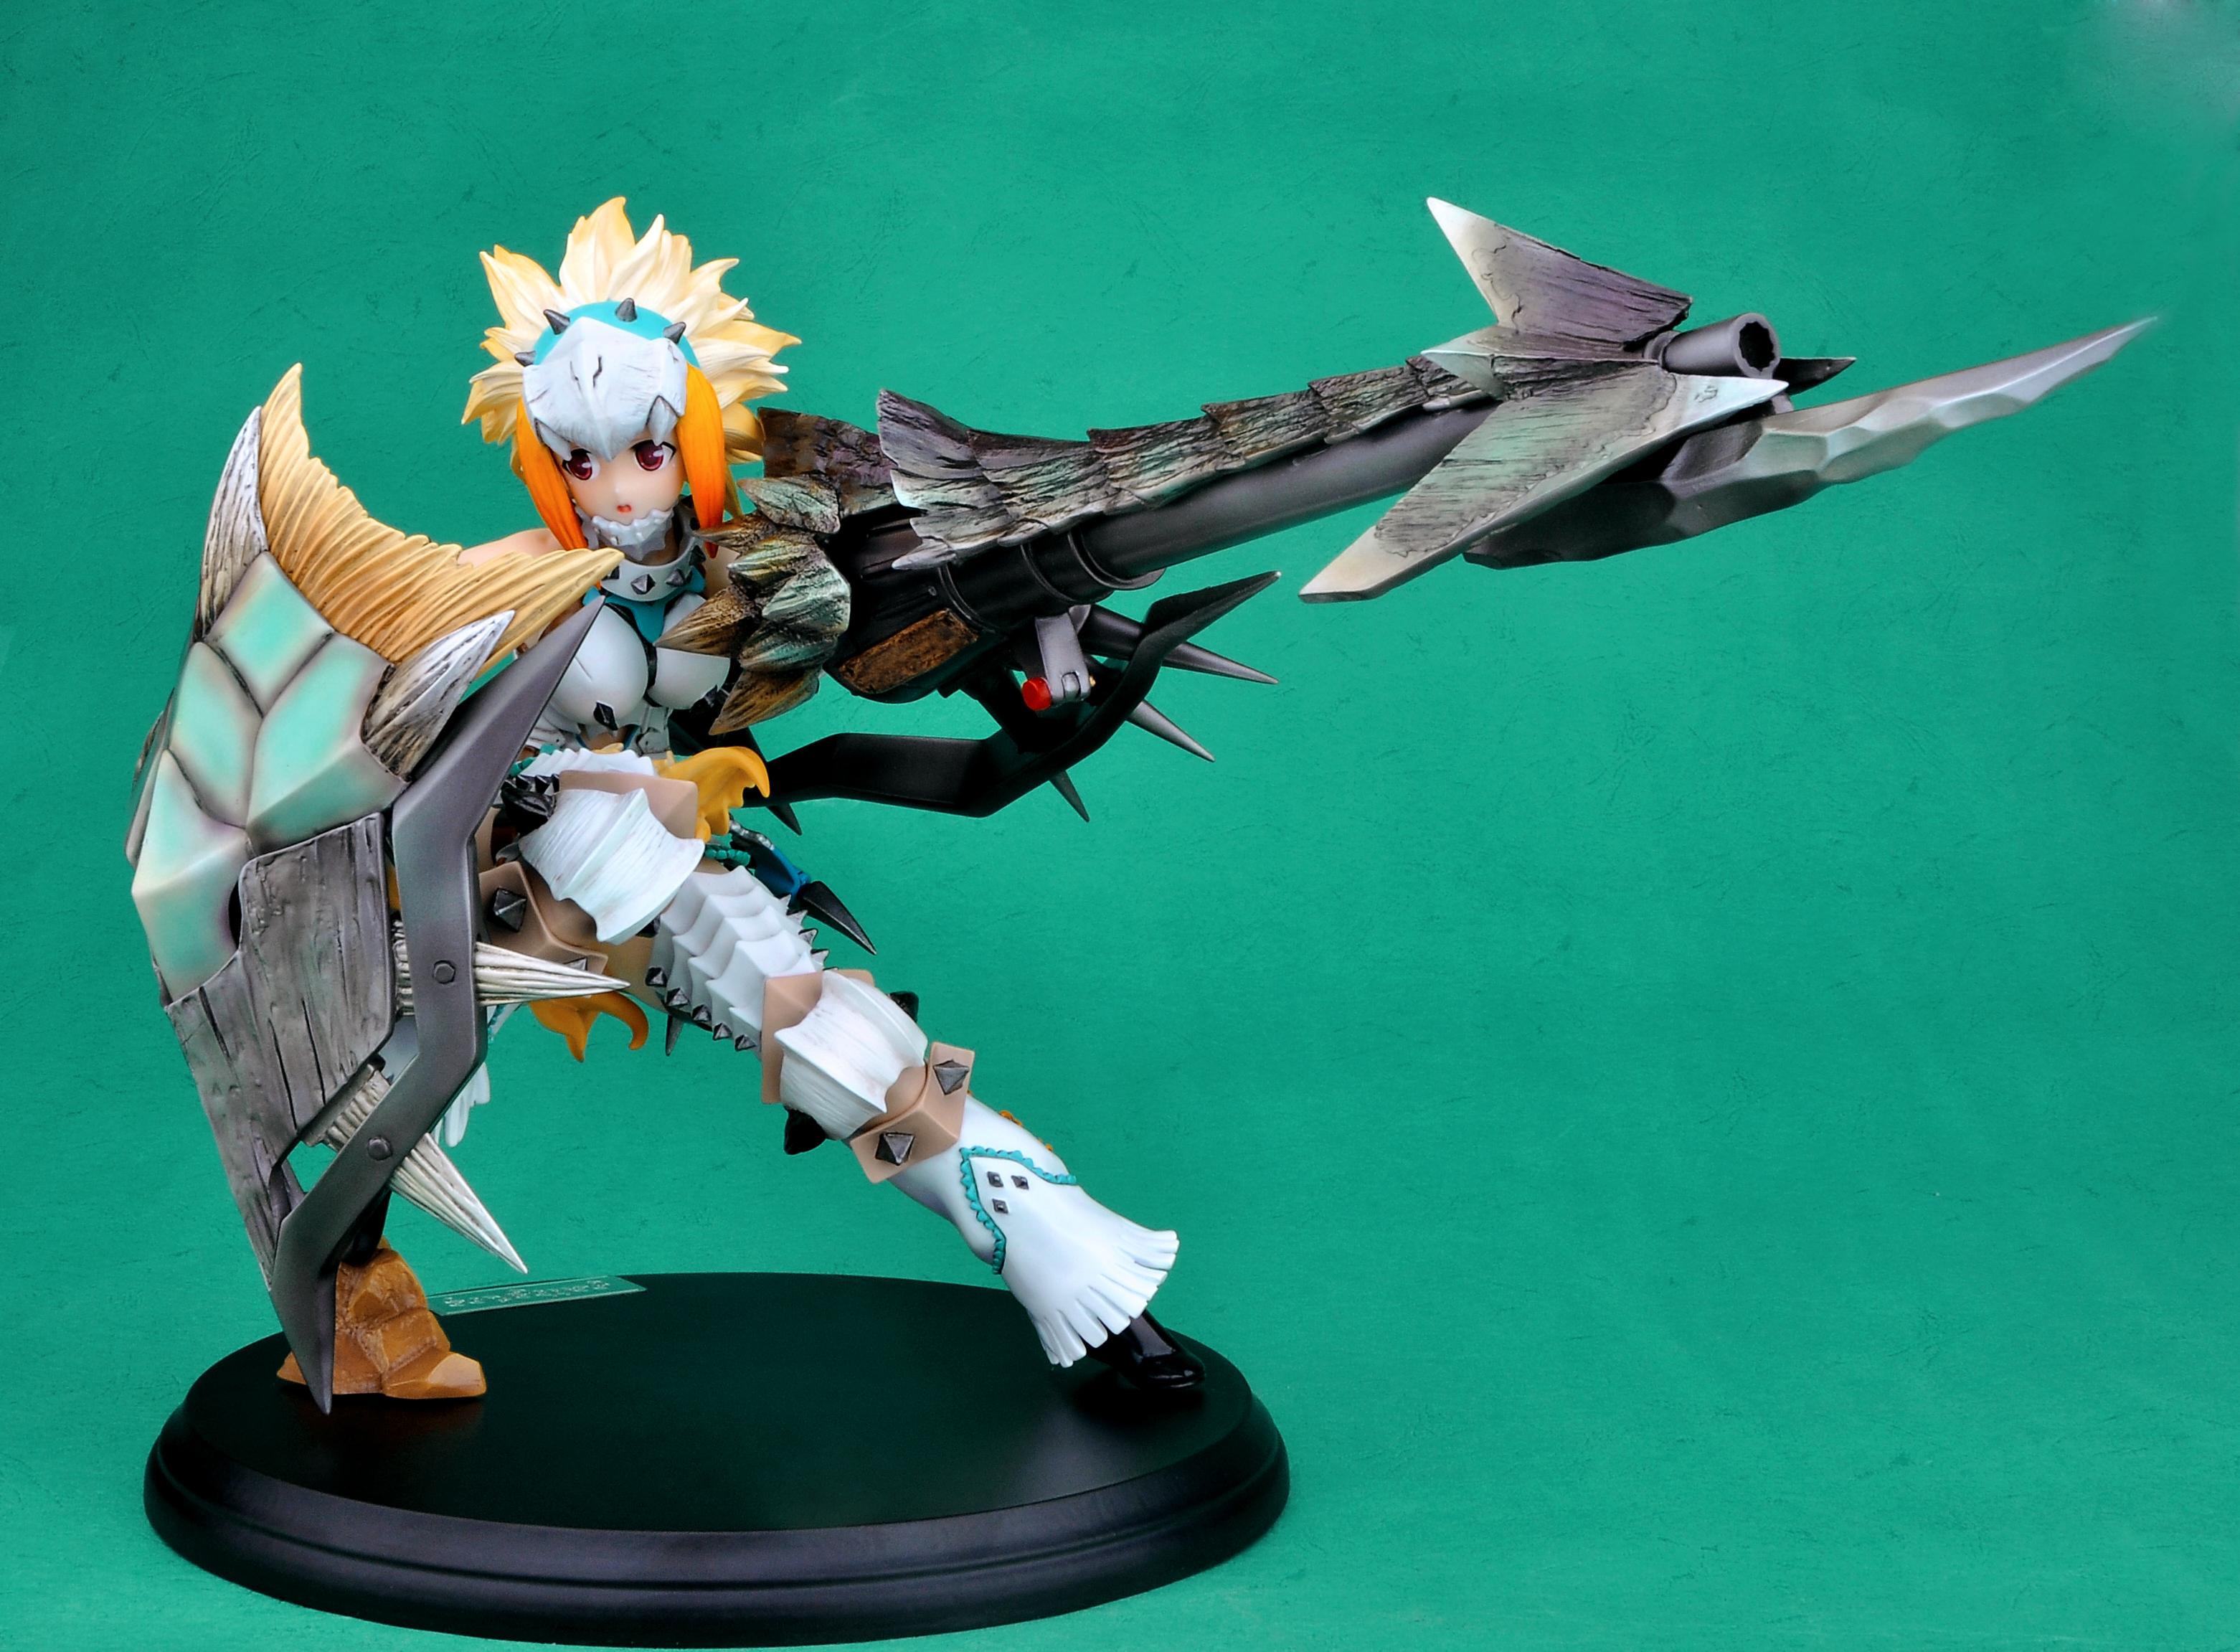 Berio Armor Hunter Monster Hunter prepainted figure haruhichan.com Monster Hunter video game figure 11